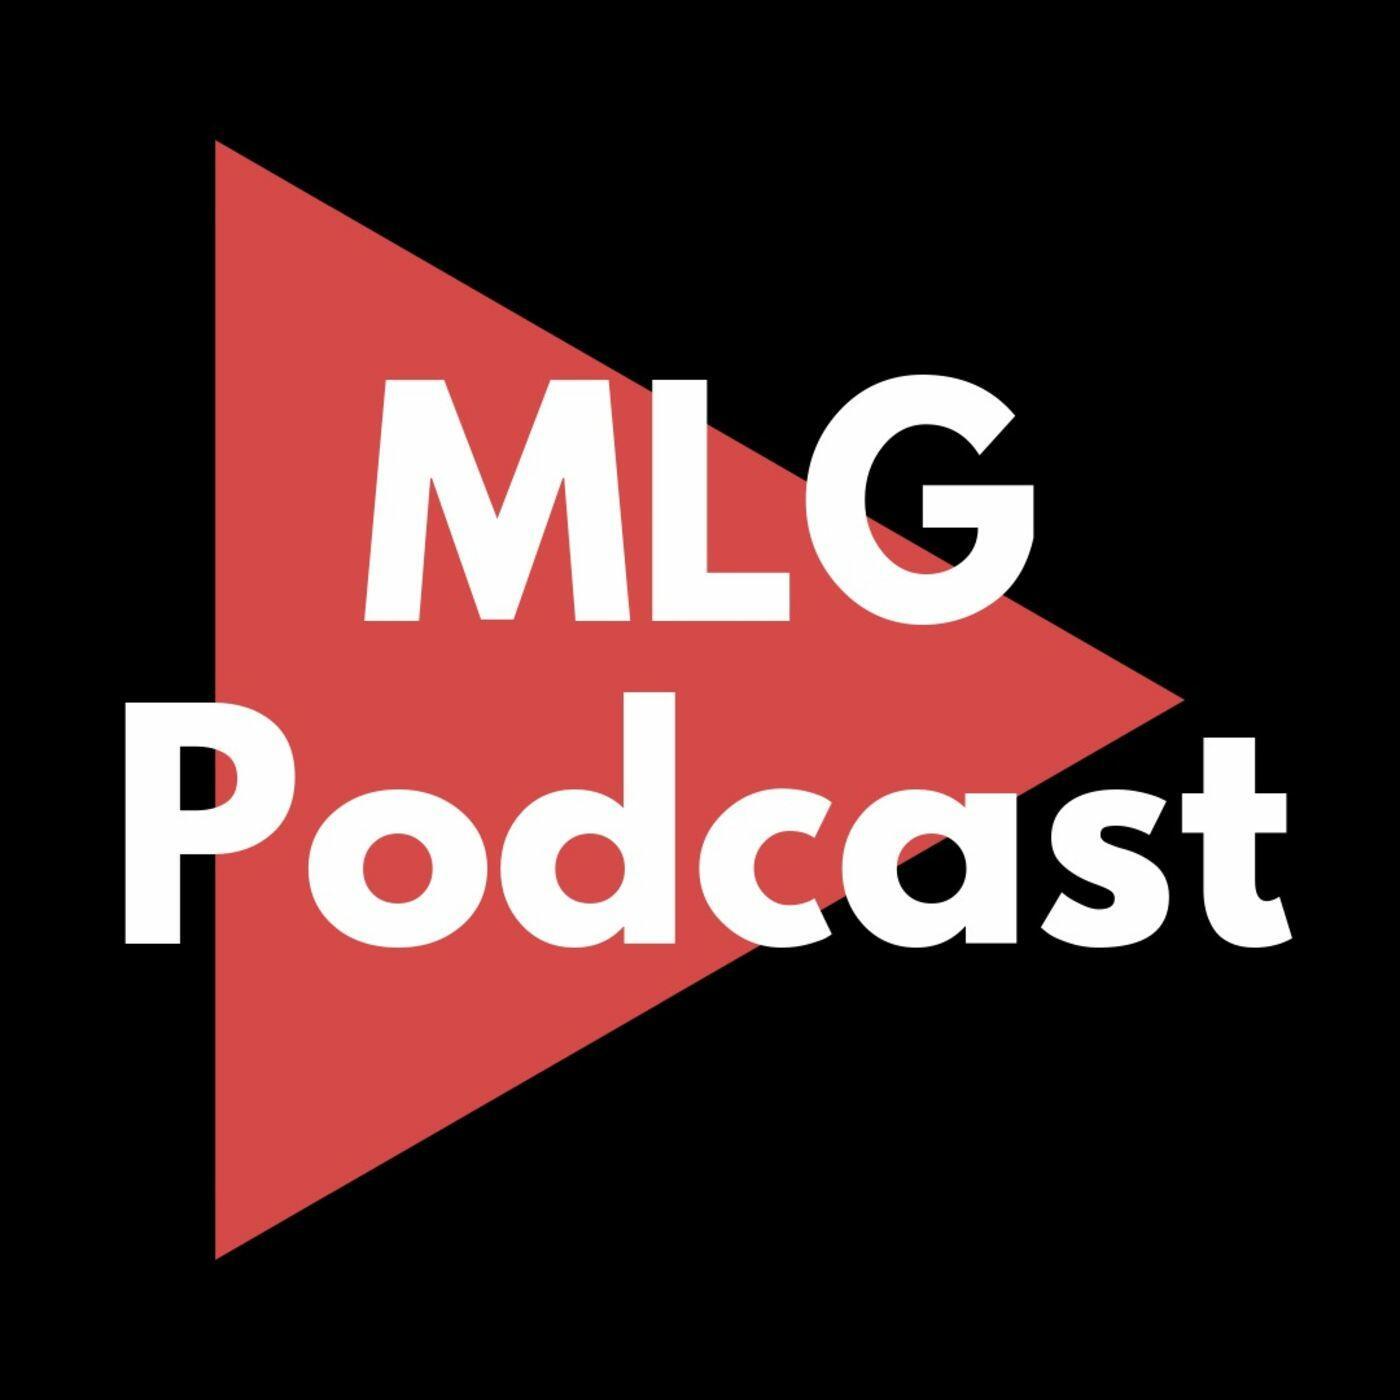 Maîtriser La Guitare Podcast